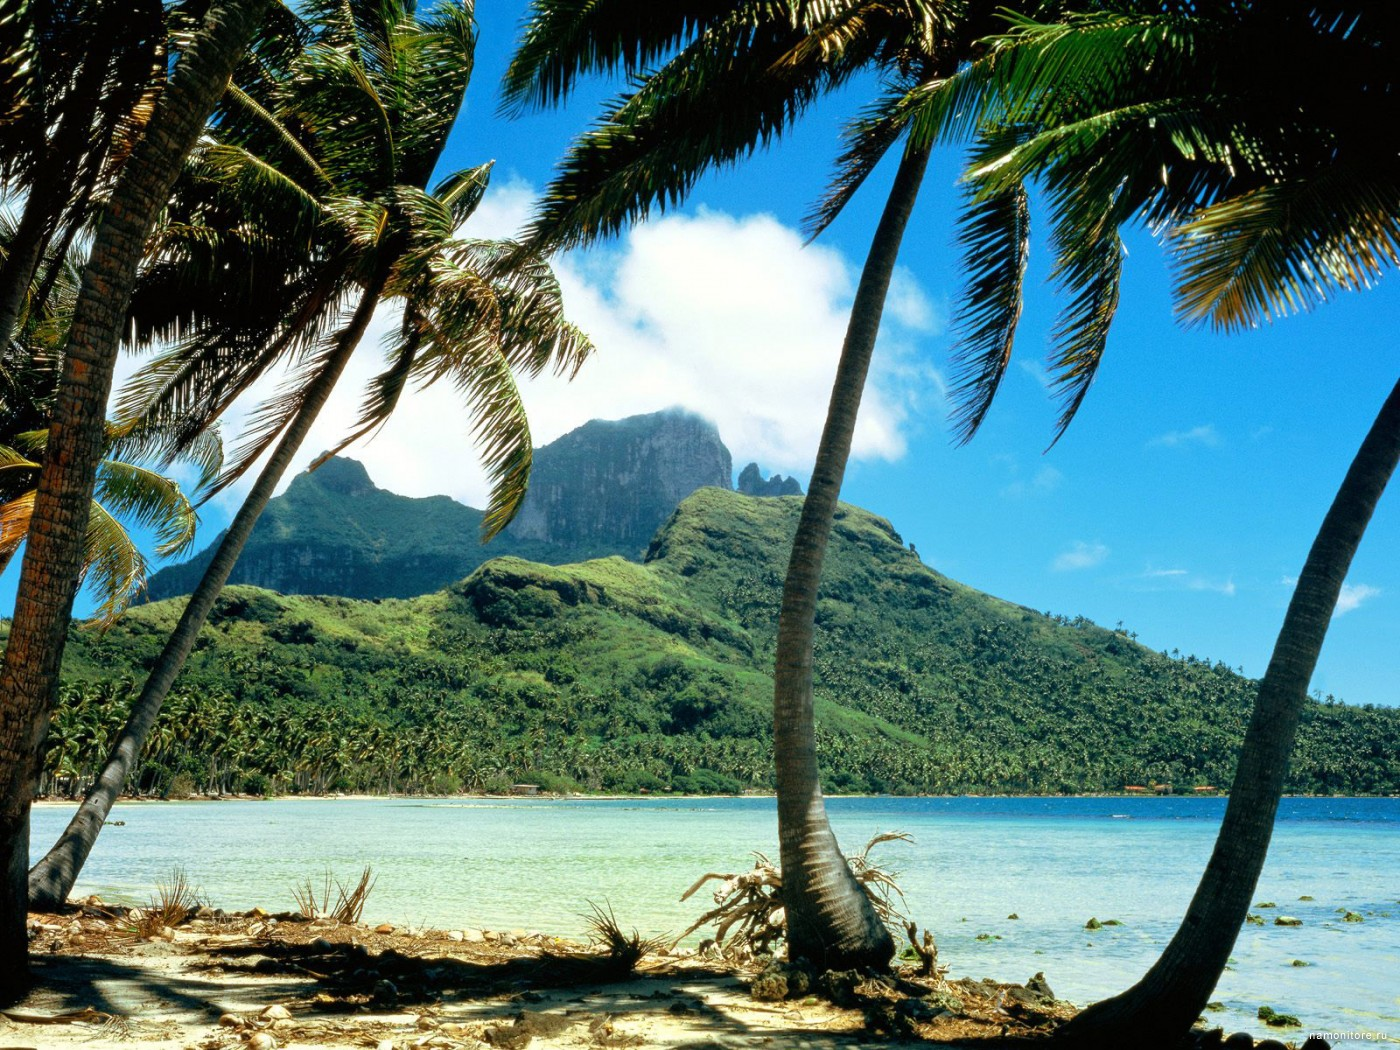 French Polynesia, an island Bora Bora, clipart, coast, island.